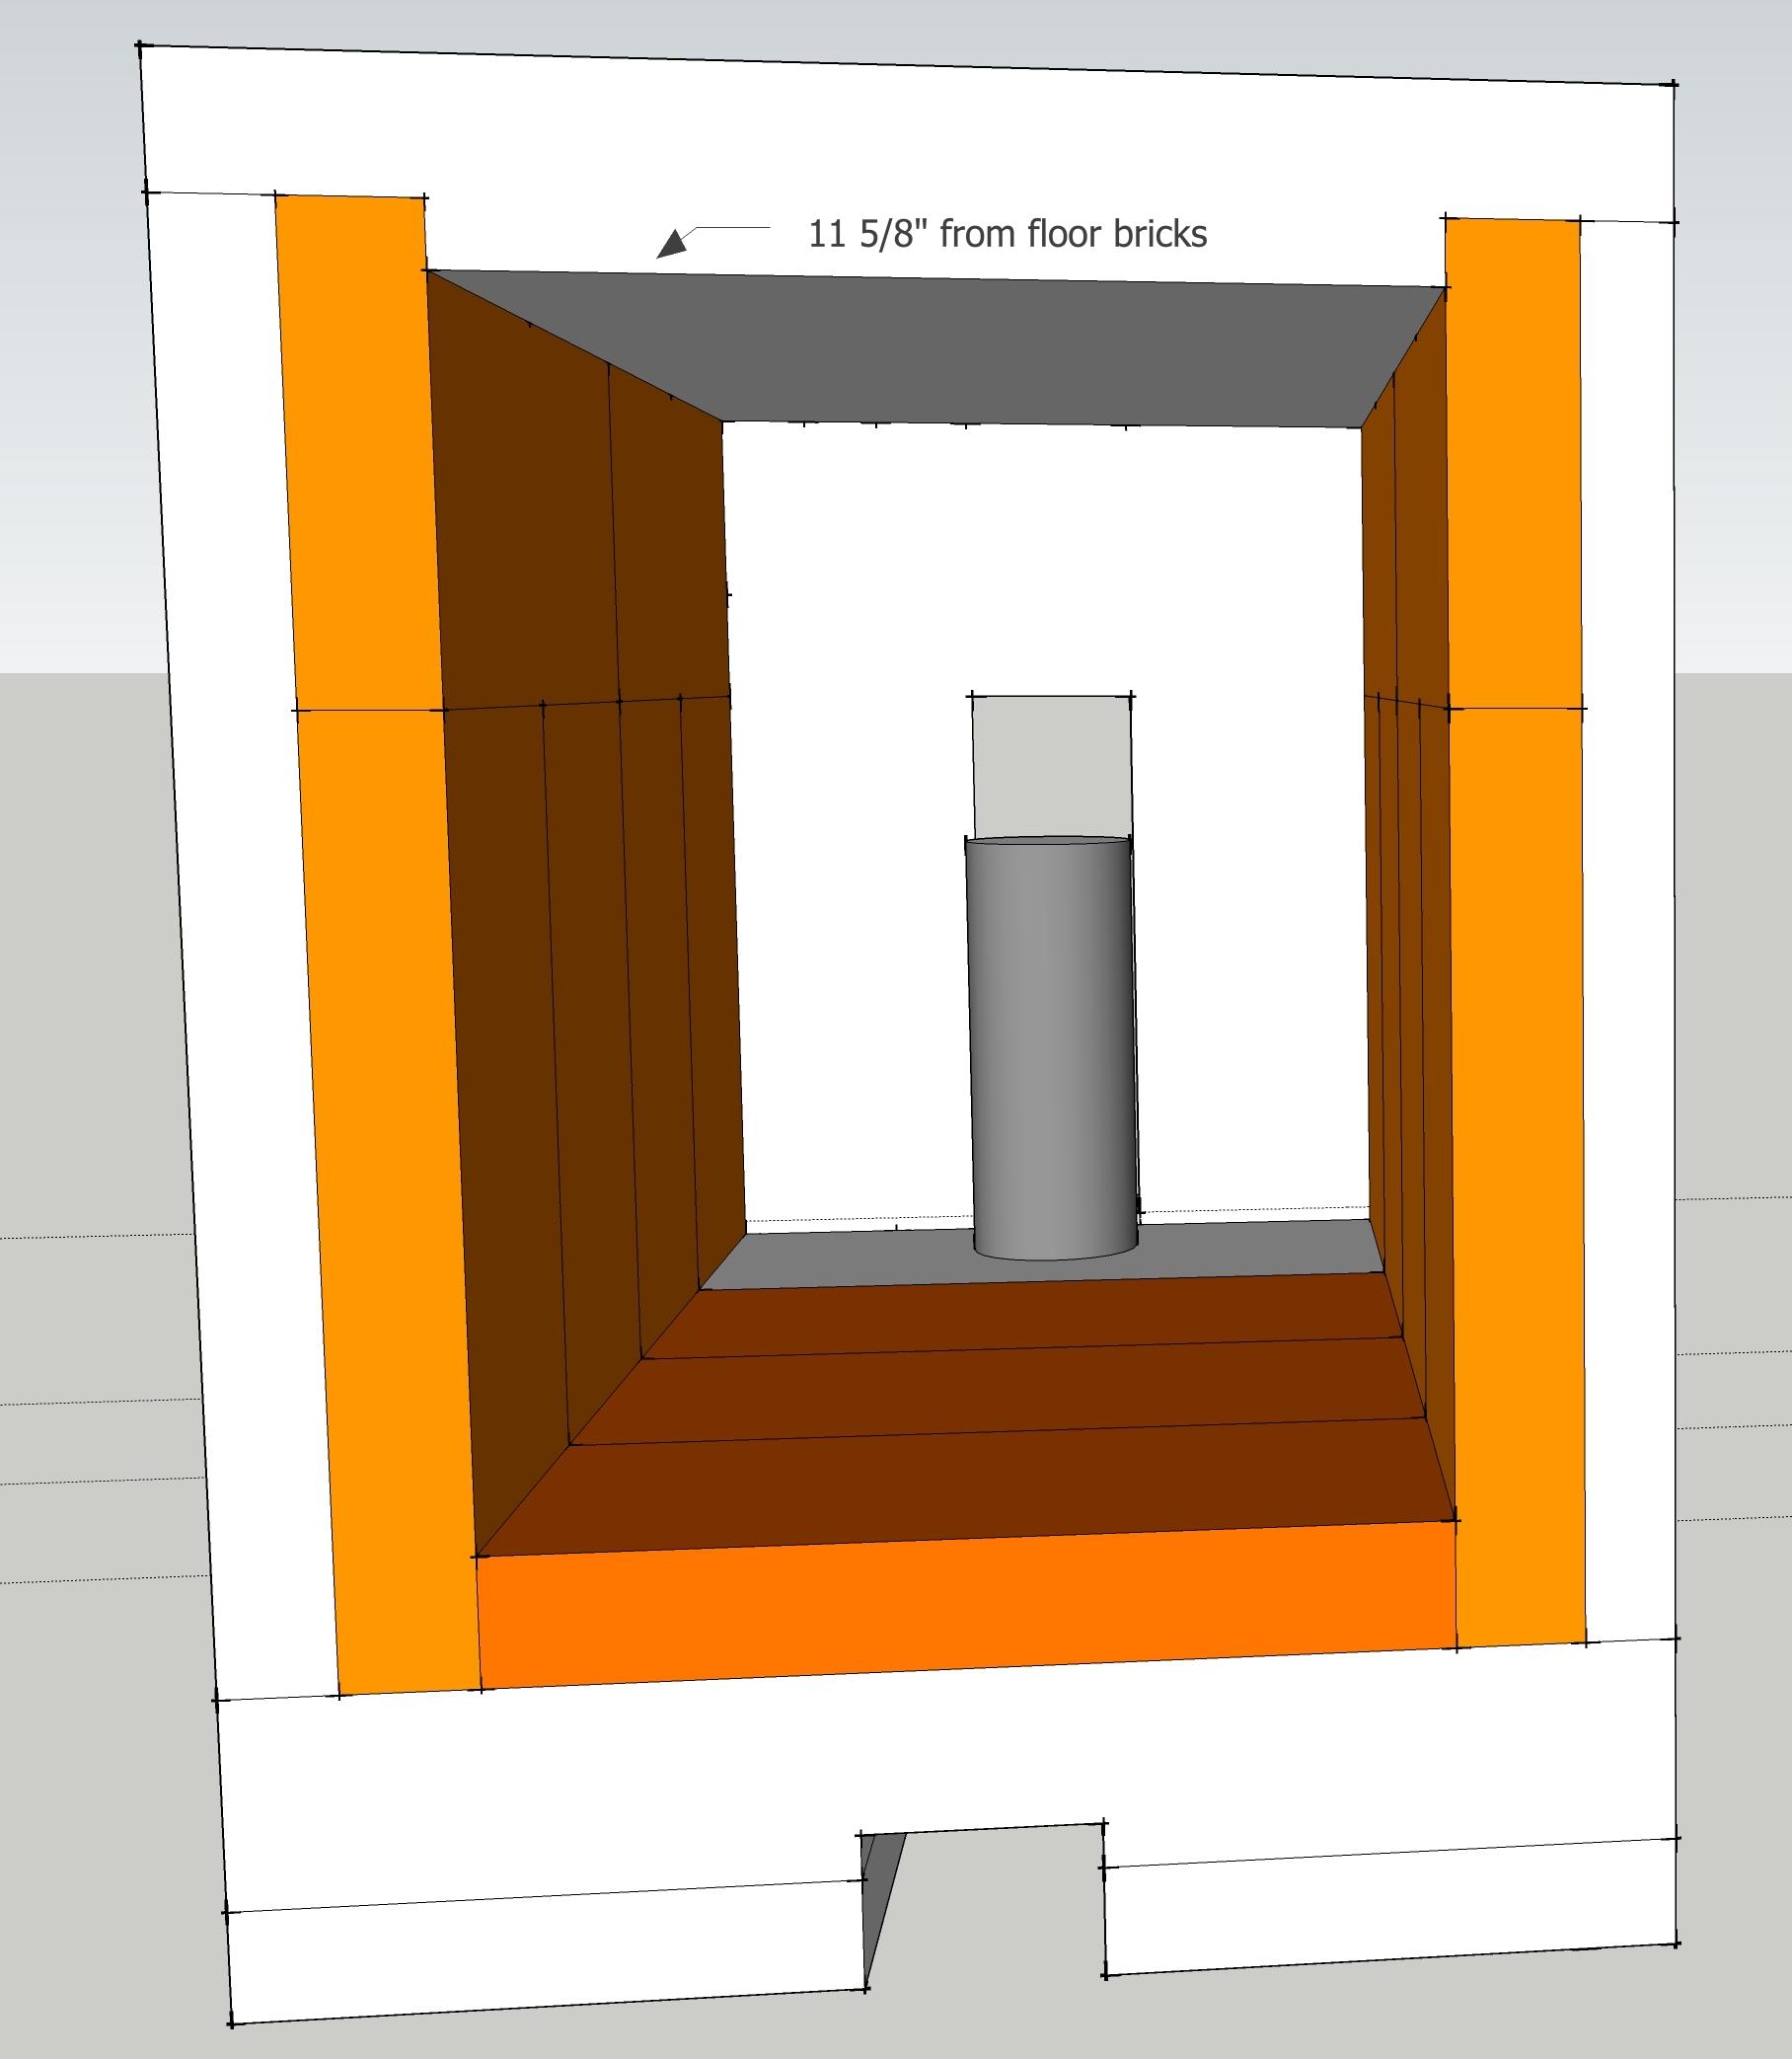 batch box lined with bricks